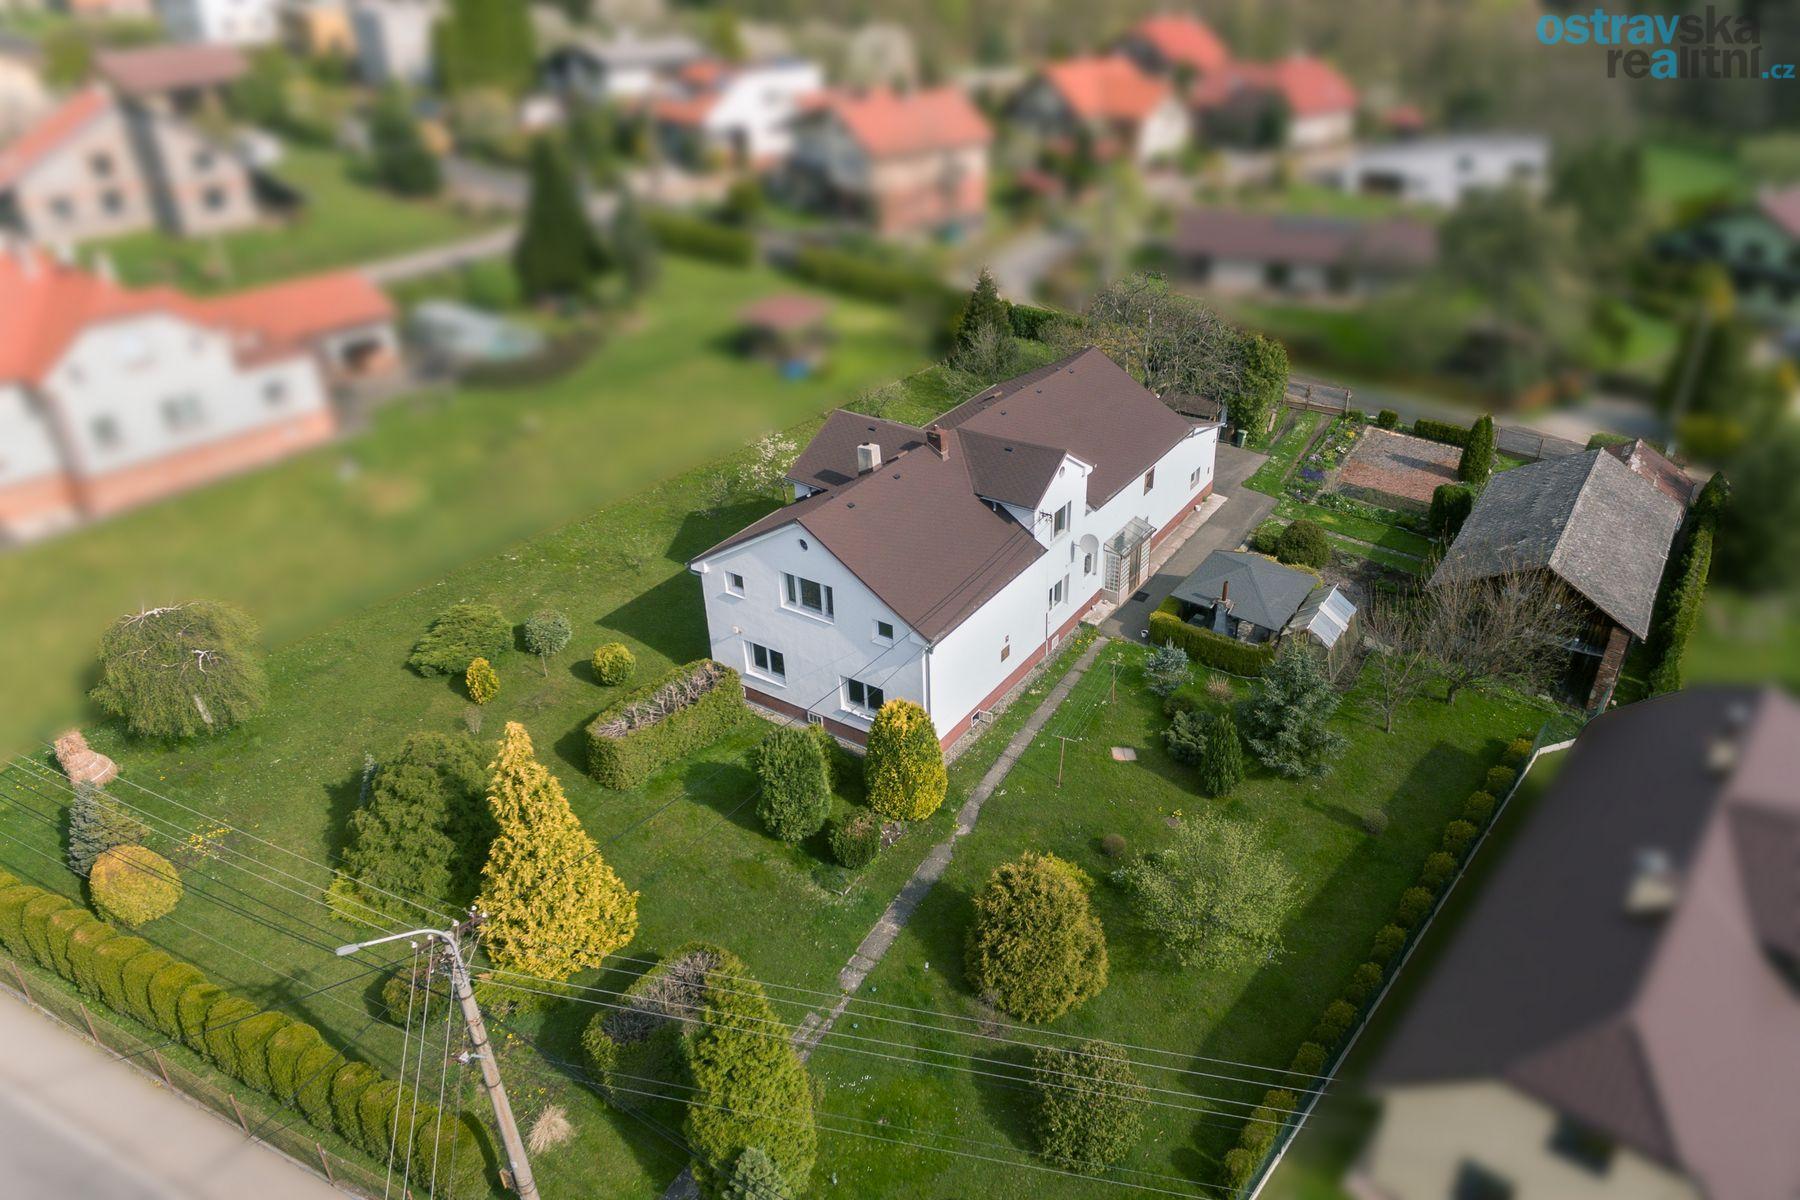 Prodej, rodinný dům 7+2, Ostrava - Plesná, ul. 26. dubna, 260 m2, zahrada 2.068 m2